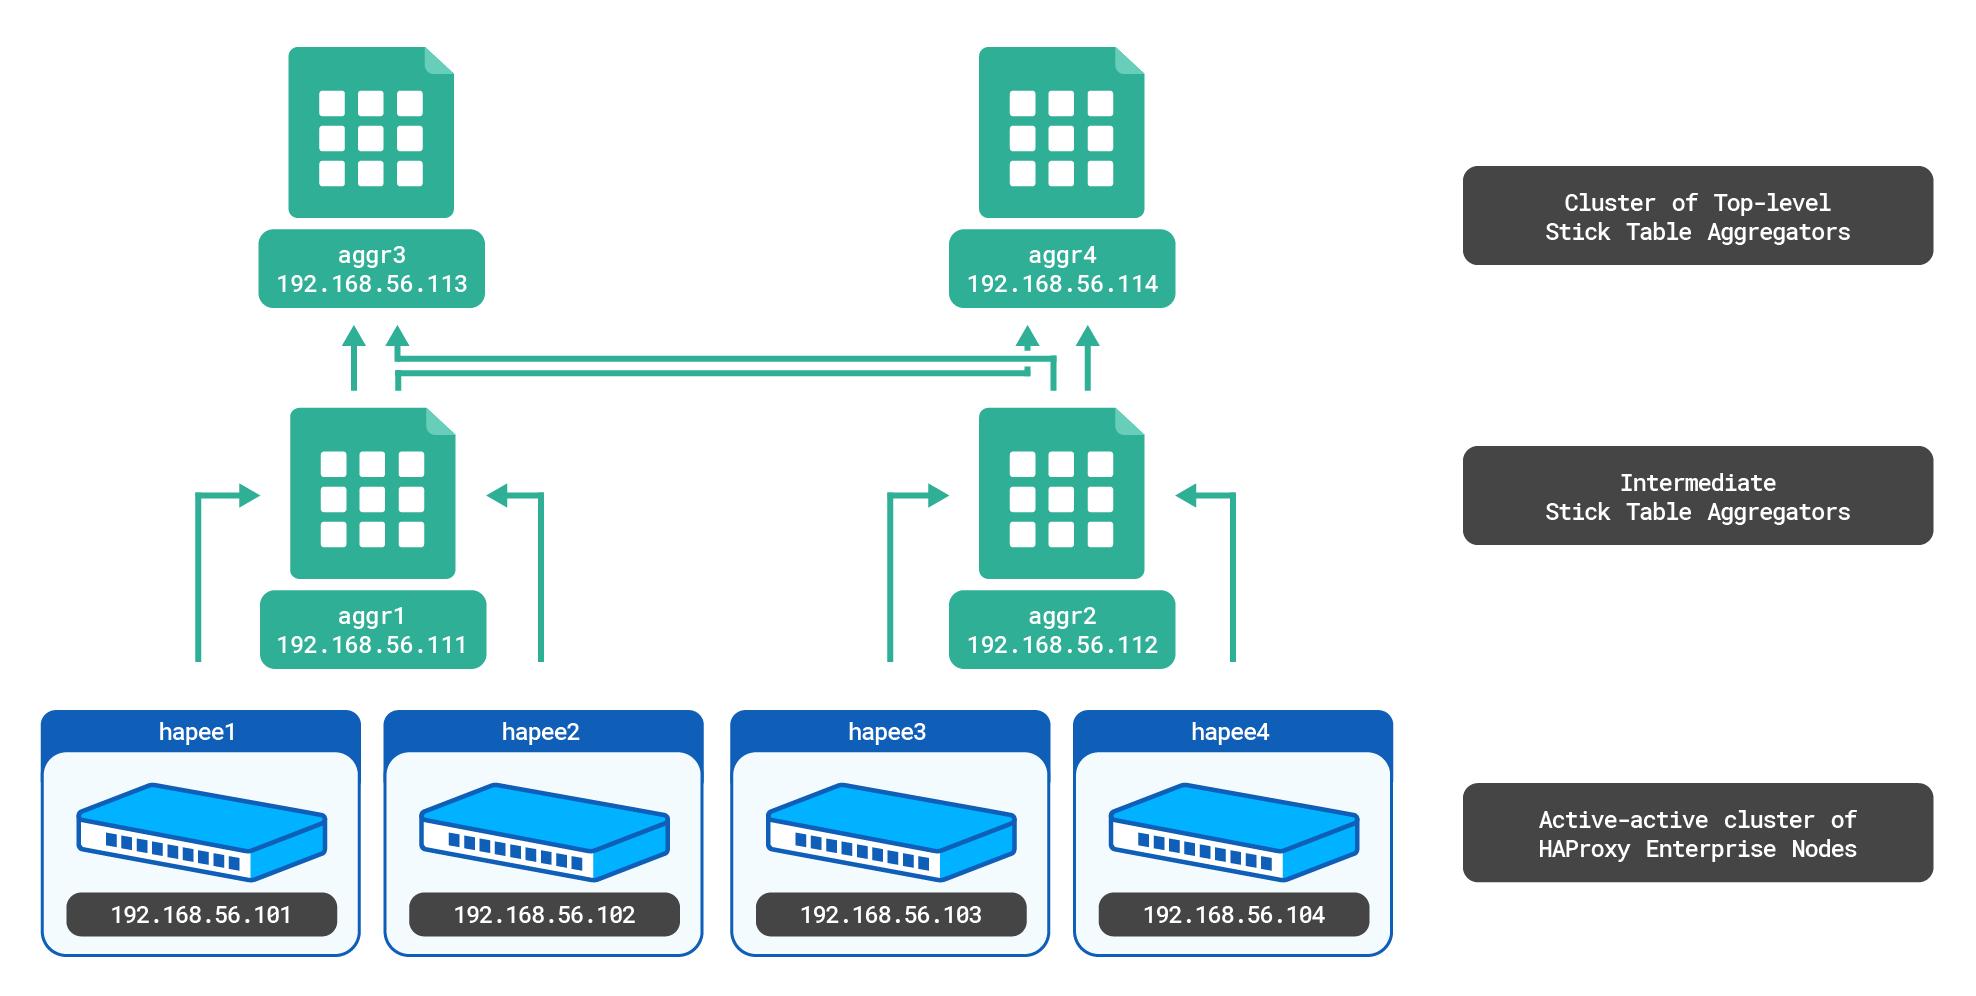 https://cdn.haproxy.com/documentation/hapee/2-1r1/assets/cluster-wide-tracking-ha-setup-3e25d8ecf8c45676e4240bfd3064aa1f880aec0f81fe28afeaf9cd0516086fd7.png